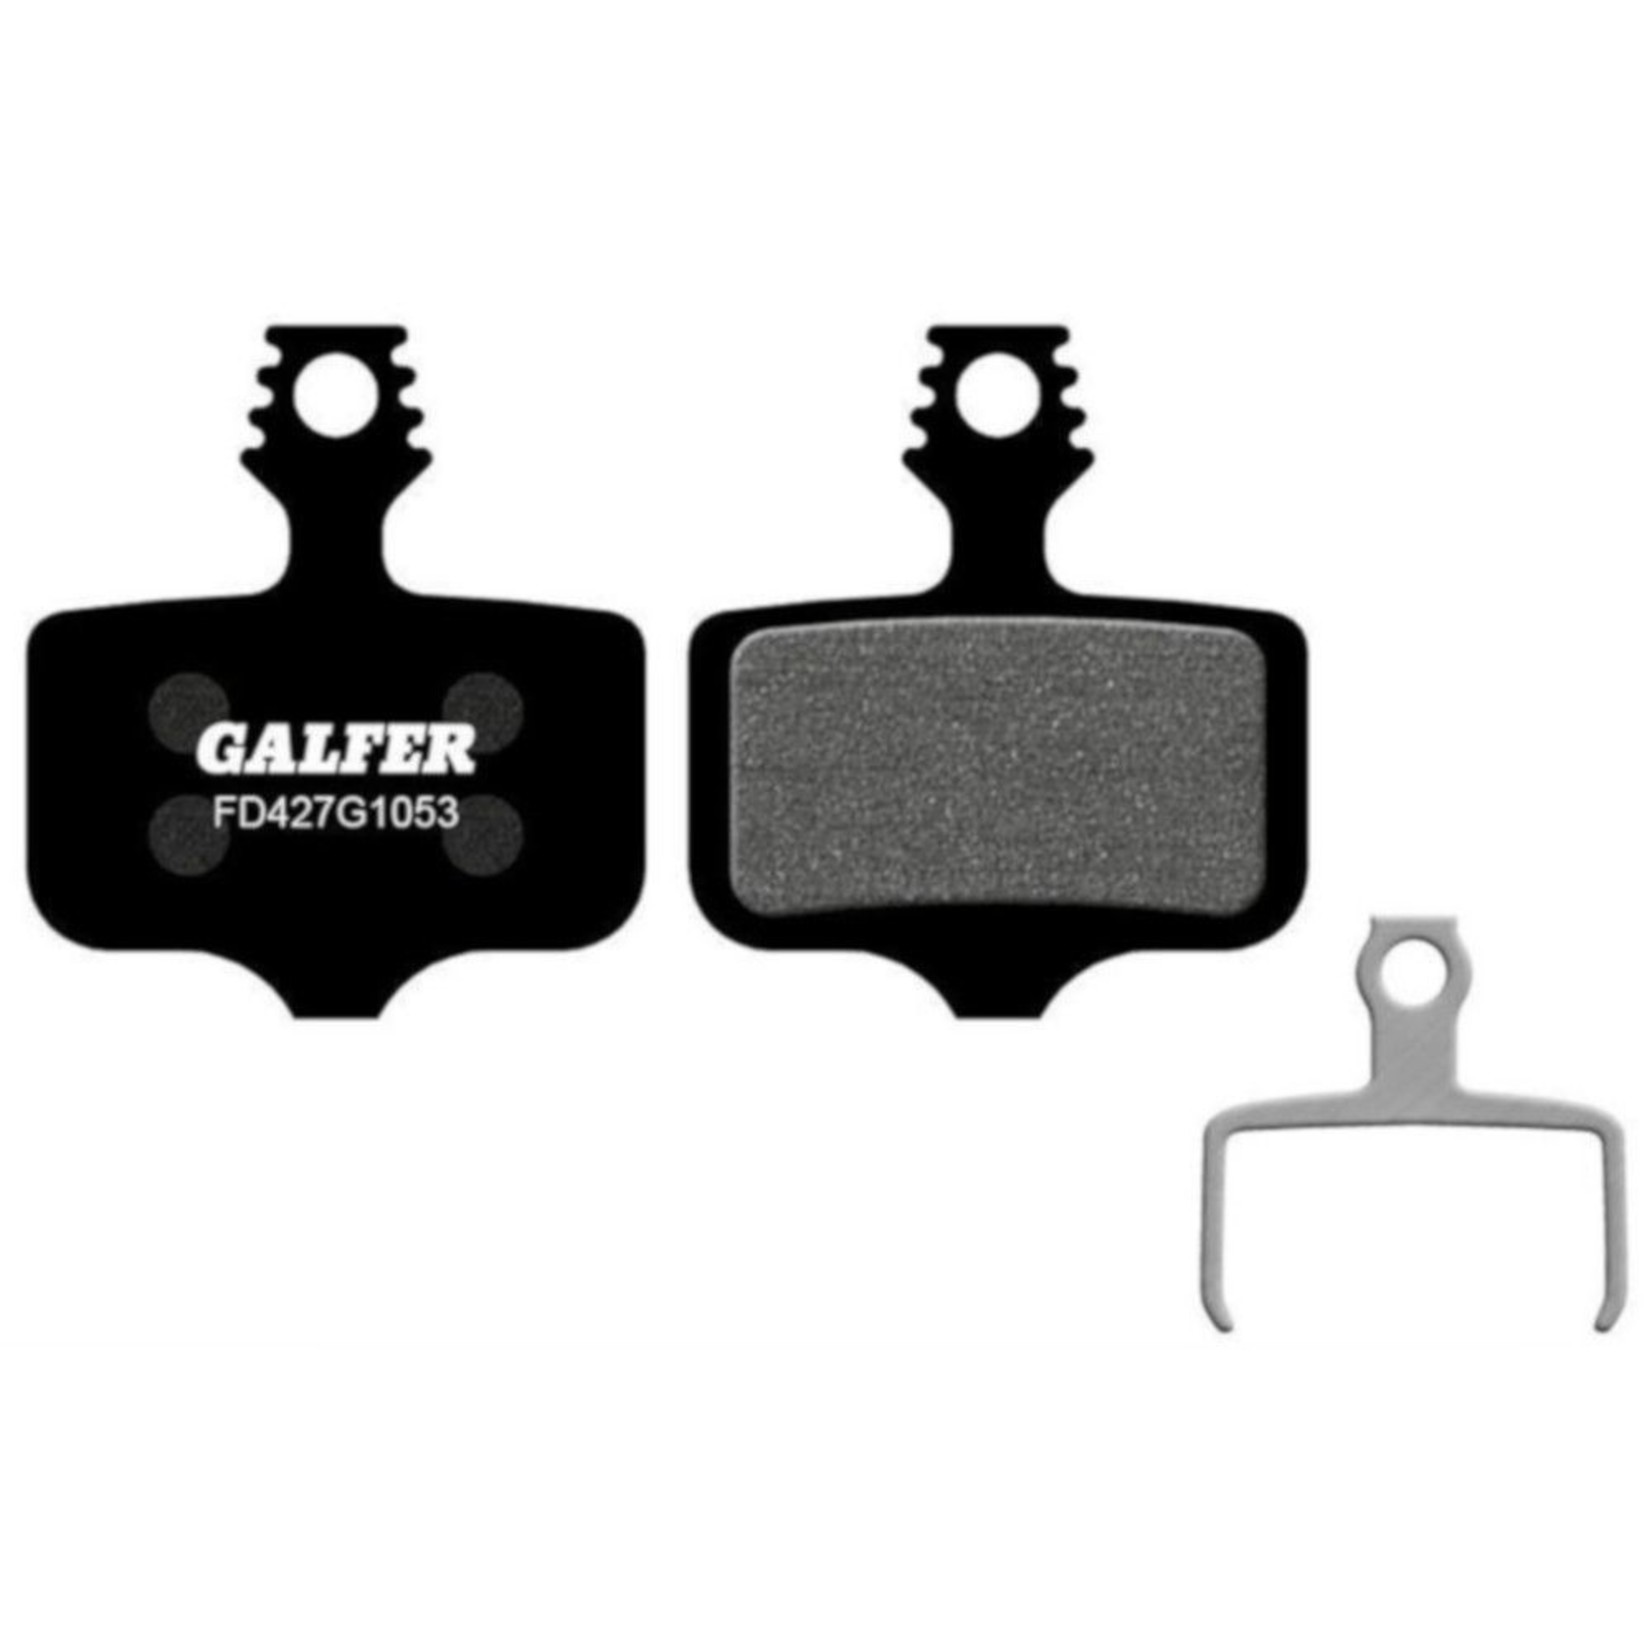 Galfer Bike Galfer, Disc Brake Pad Standard G1053 Elixir DB Level-T-TL